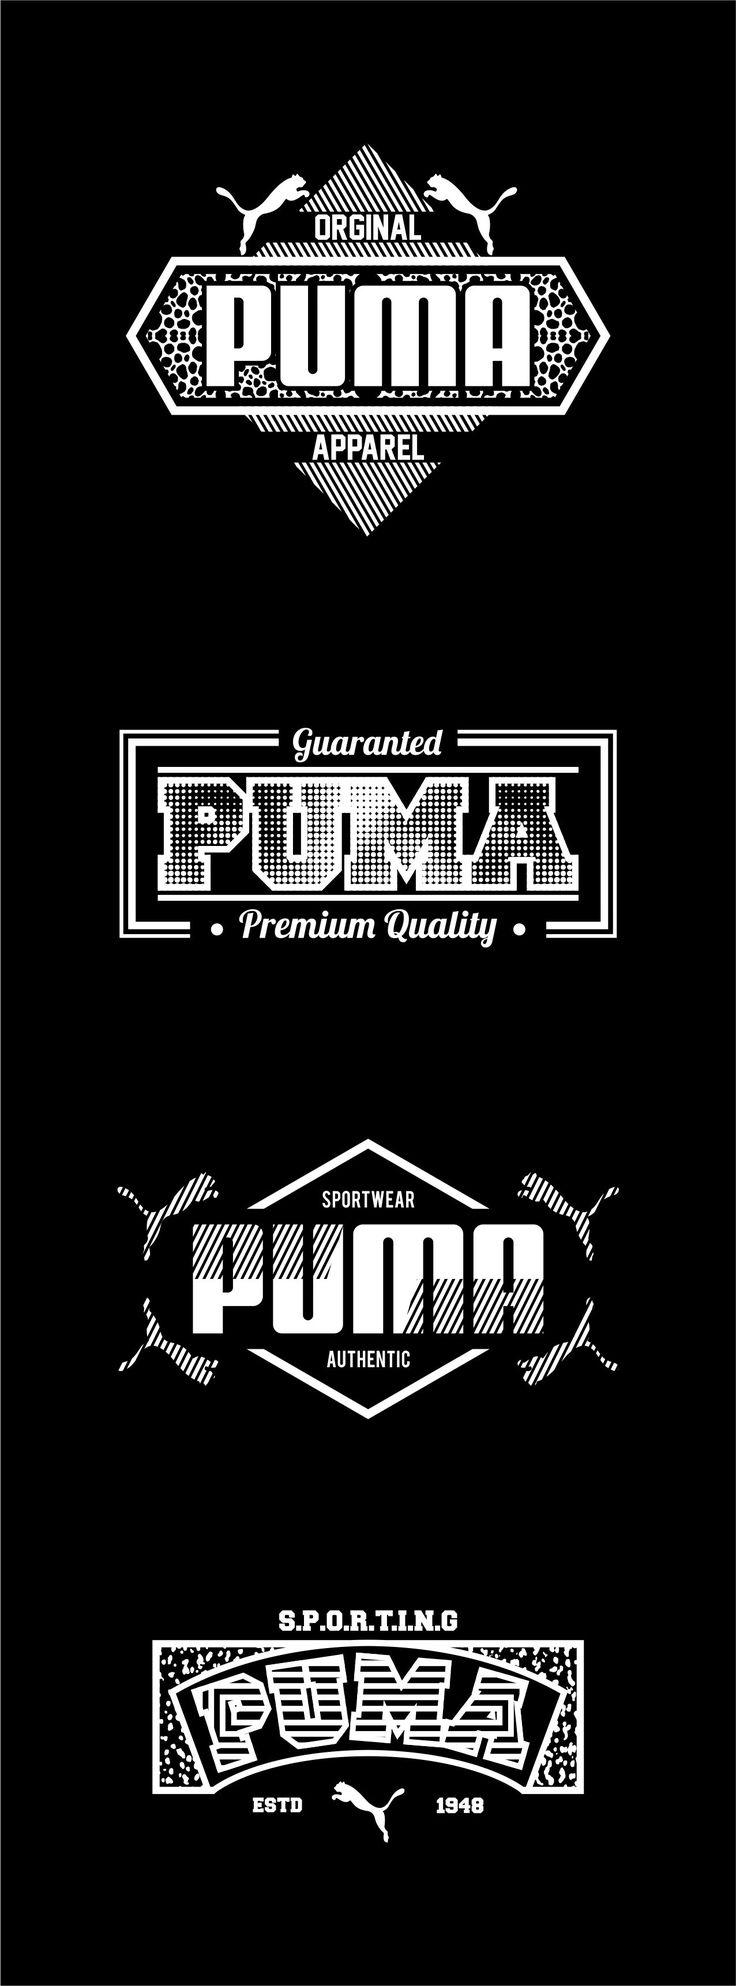 Vintage Puma #vintage #vector #vintagevector #volcom #adidas #billabong #rusty #nike #puma #levis #quiksilver #ripcurl #dc #vans #spyderbilt #reebok